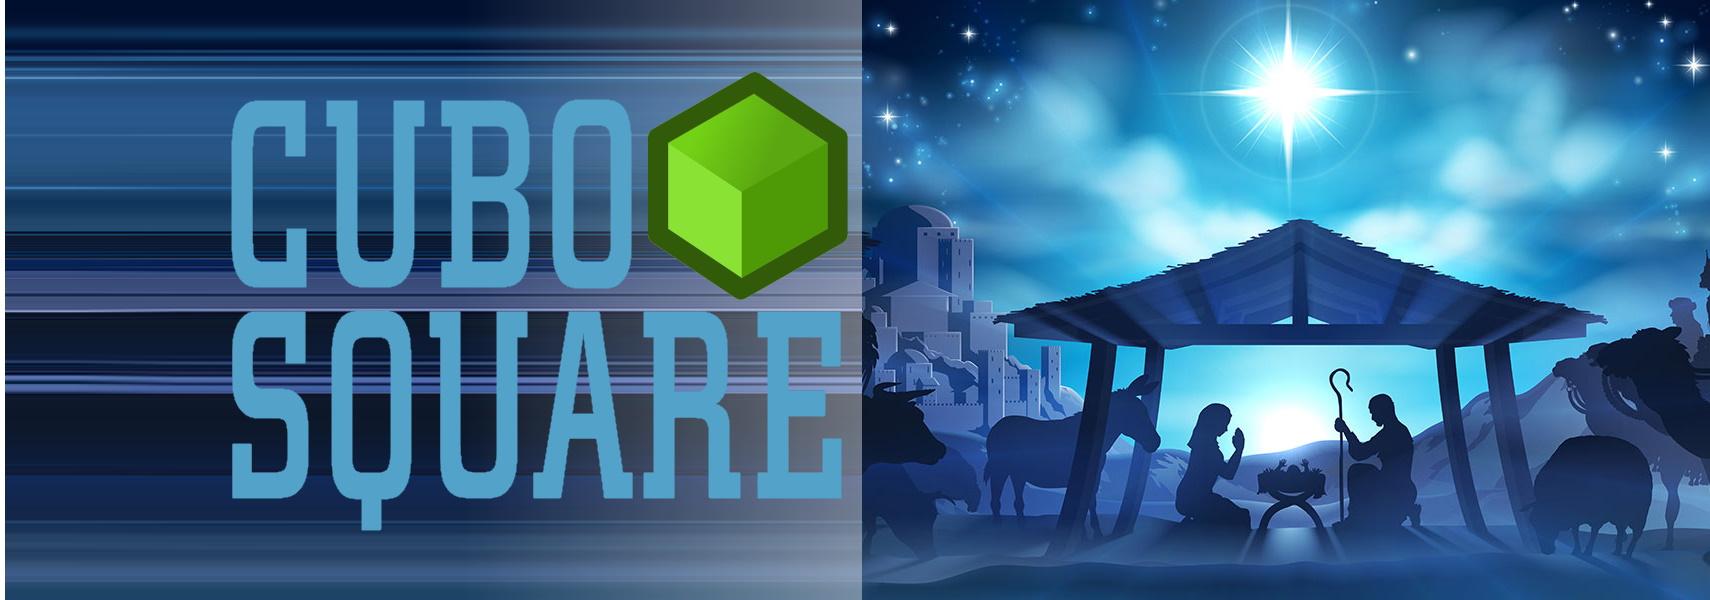 New Website Launch of Cubosquare.com